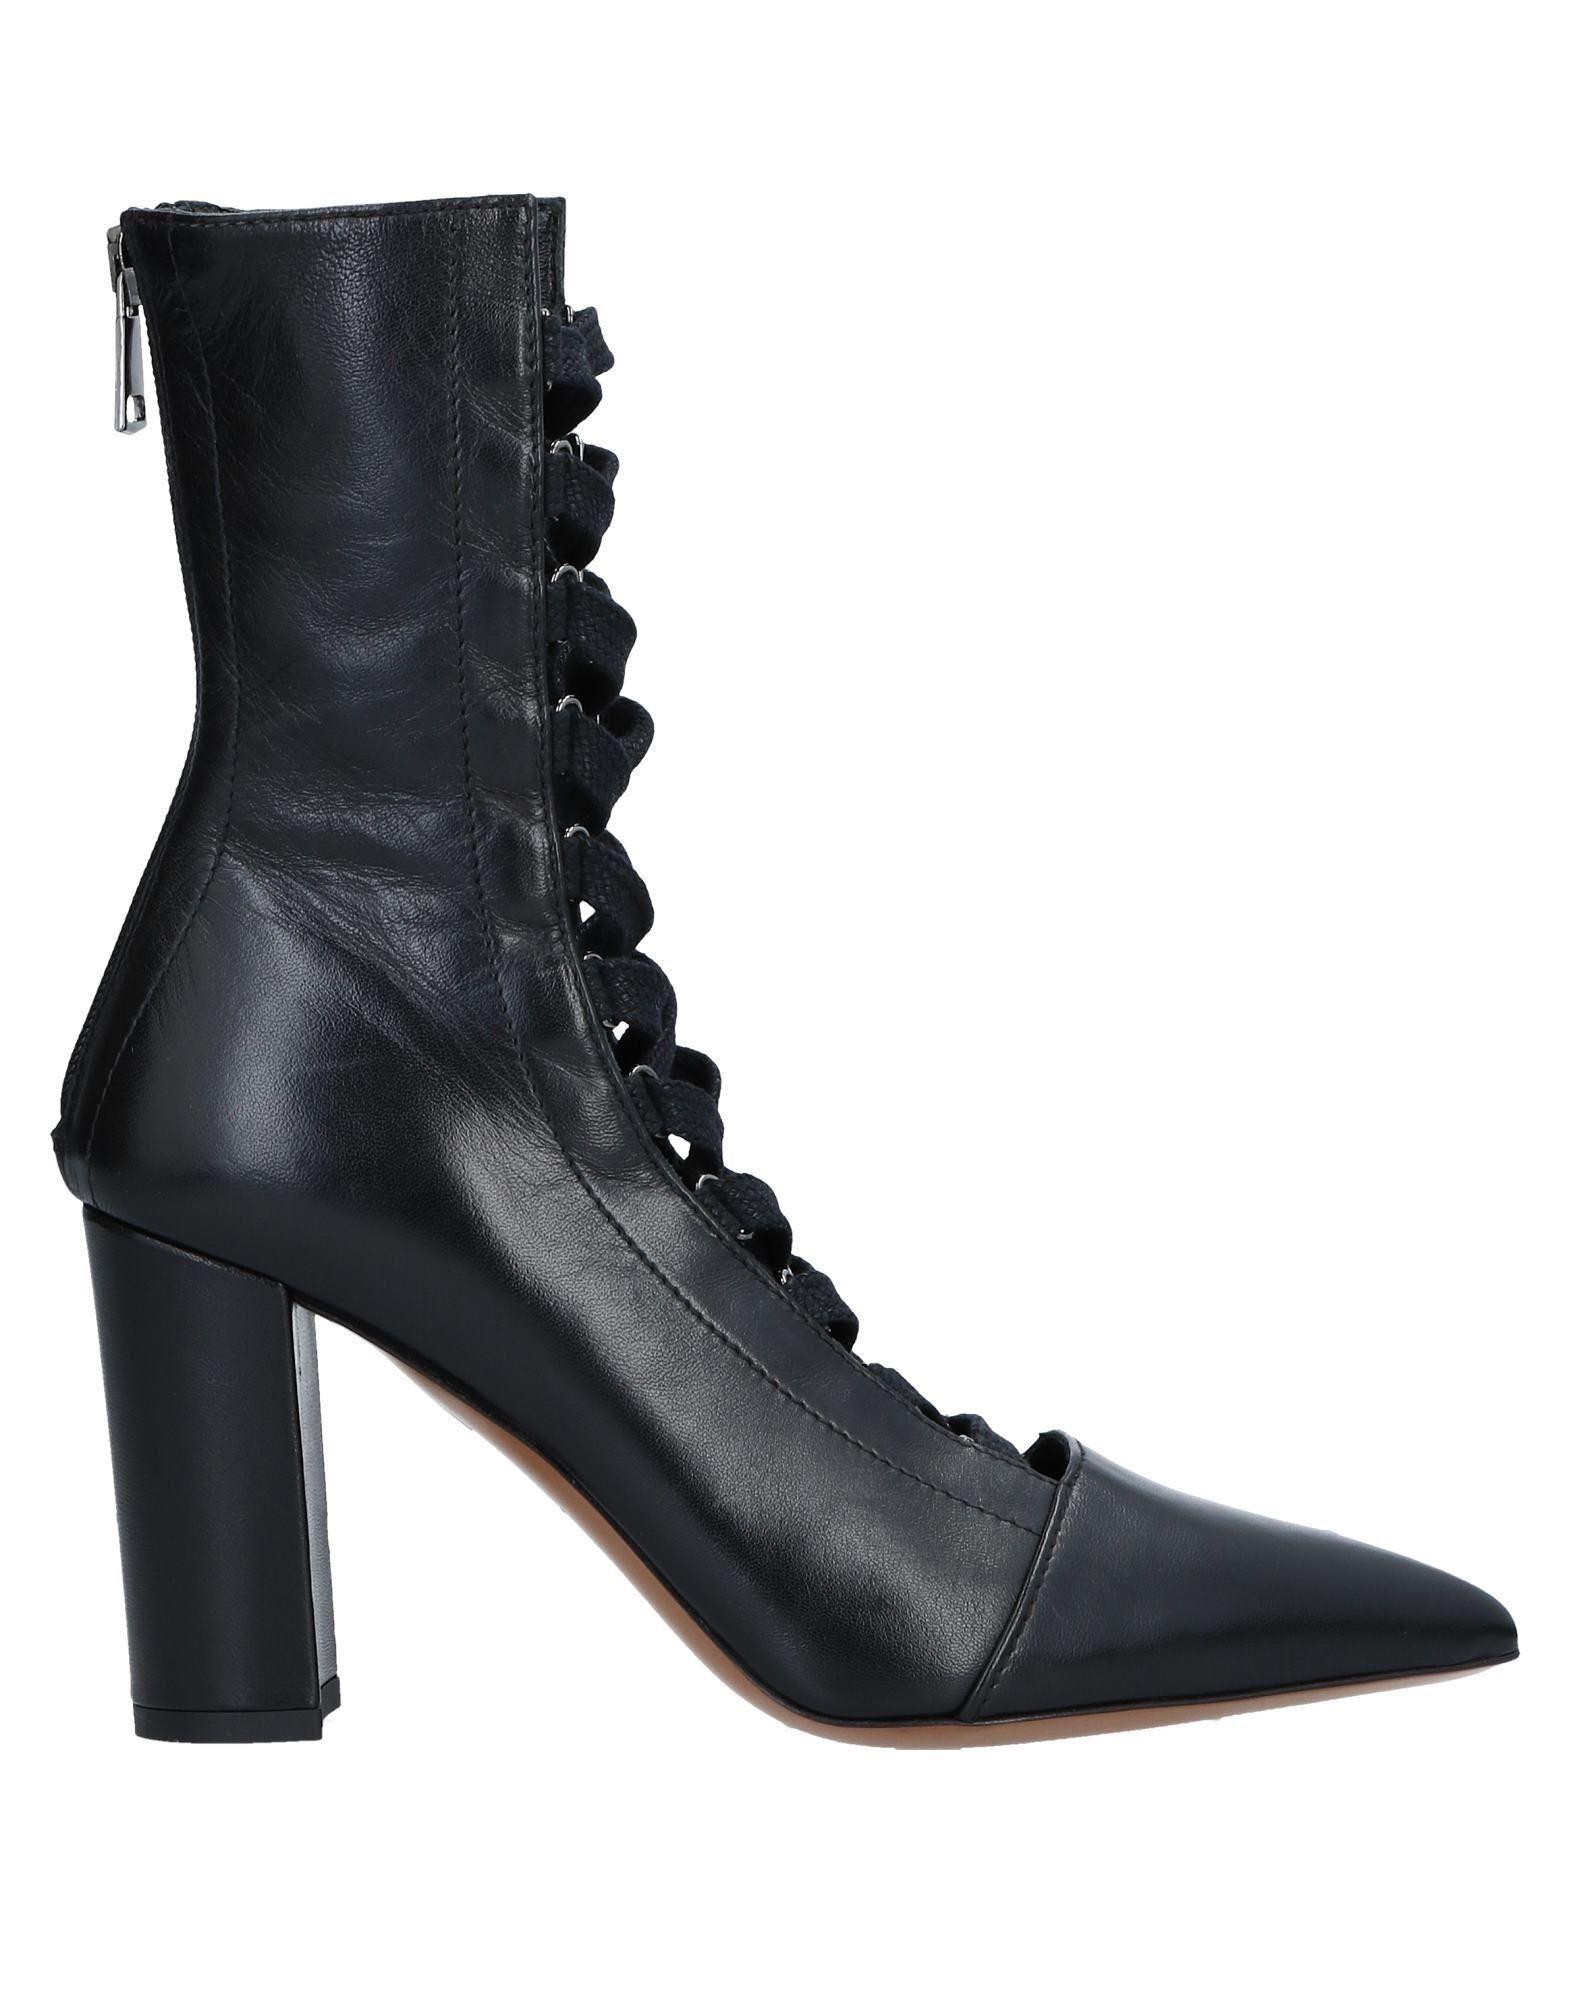 Tiffi Stiefelette Damen  11538044DE Gute Qualität beliebte Schuhe